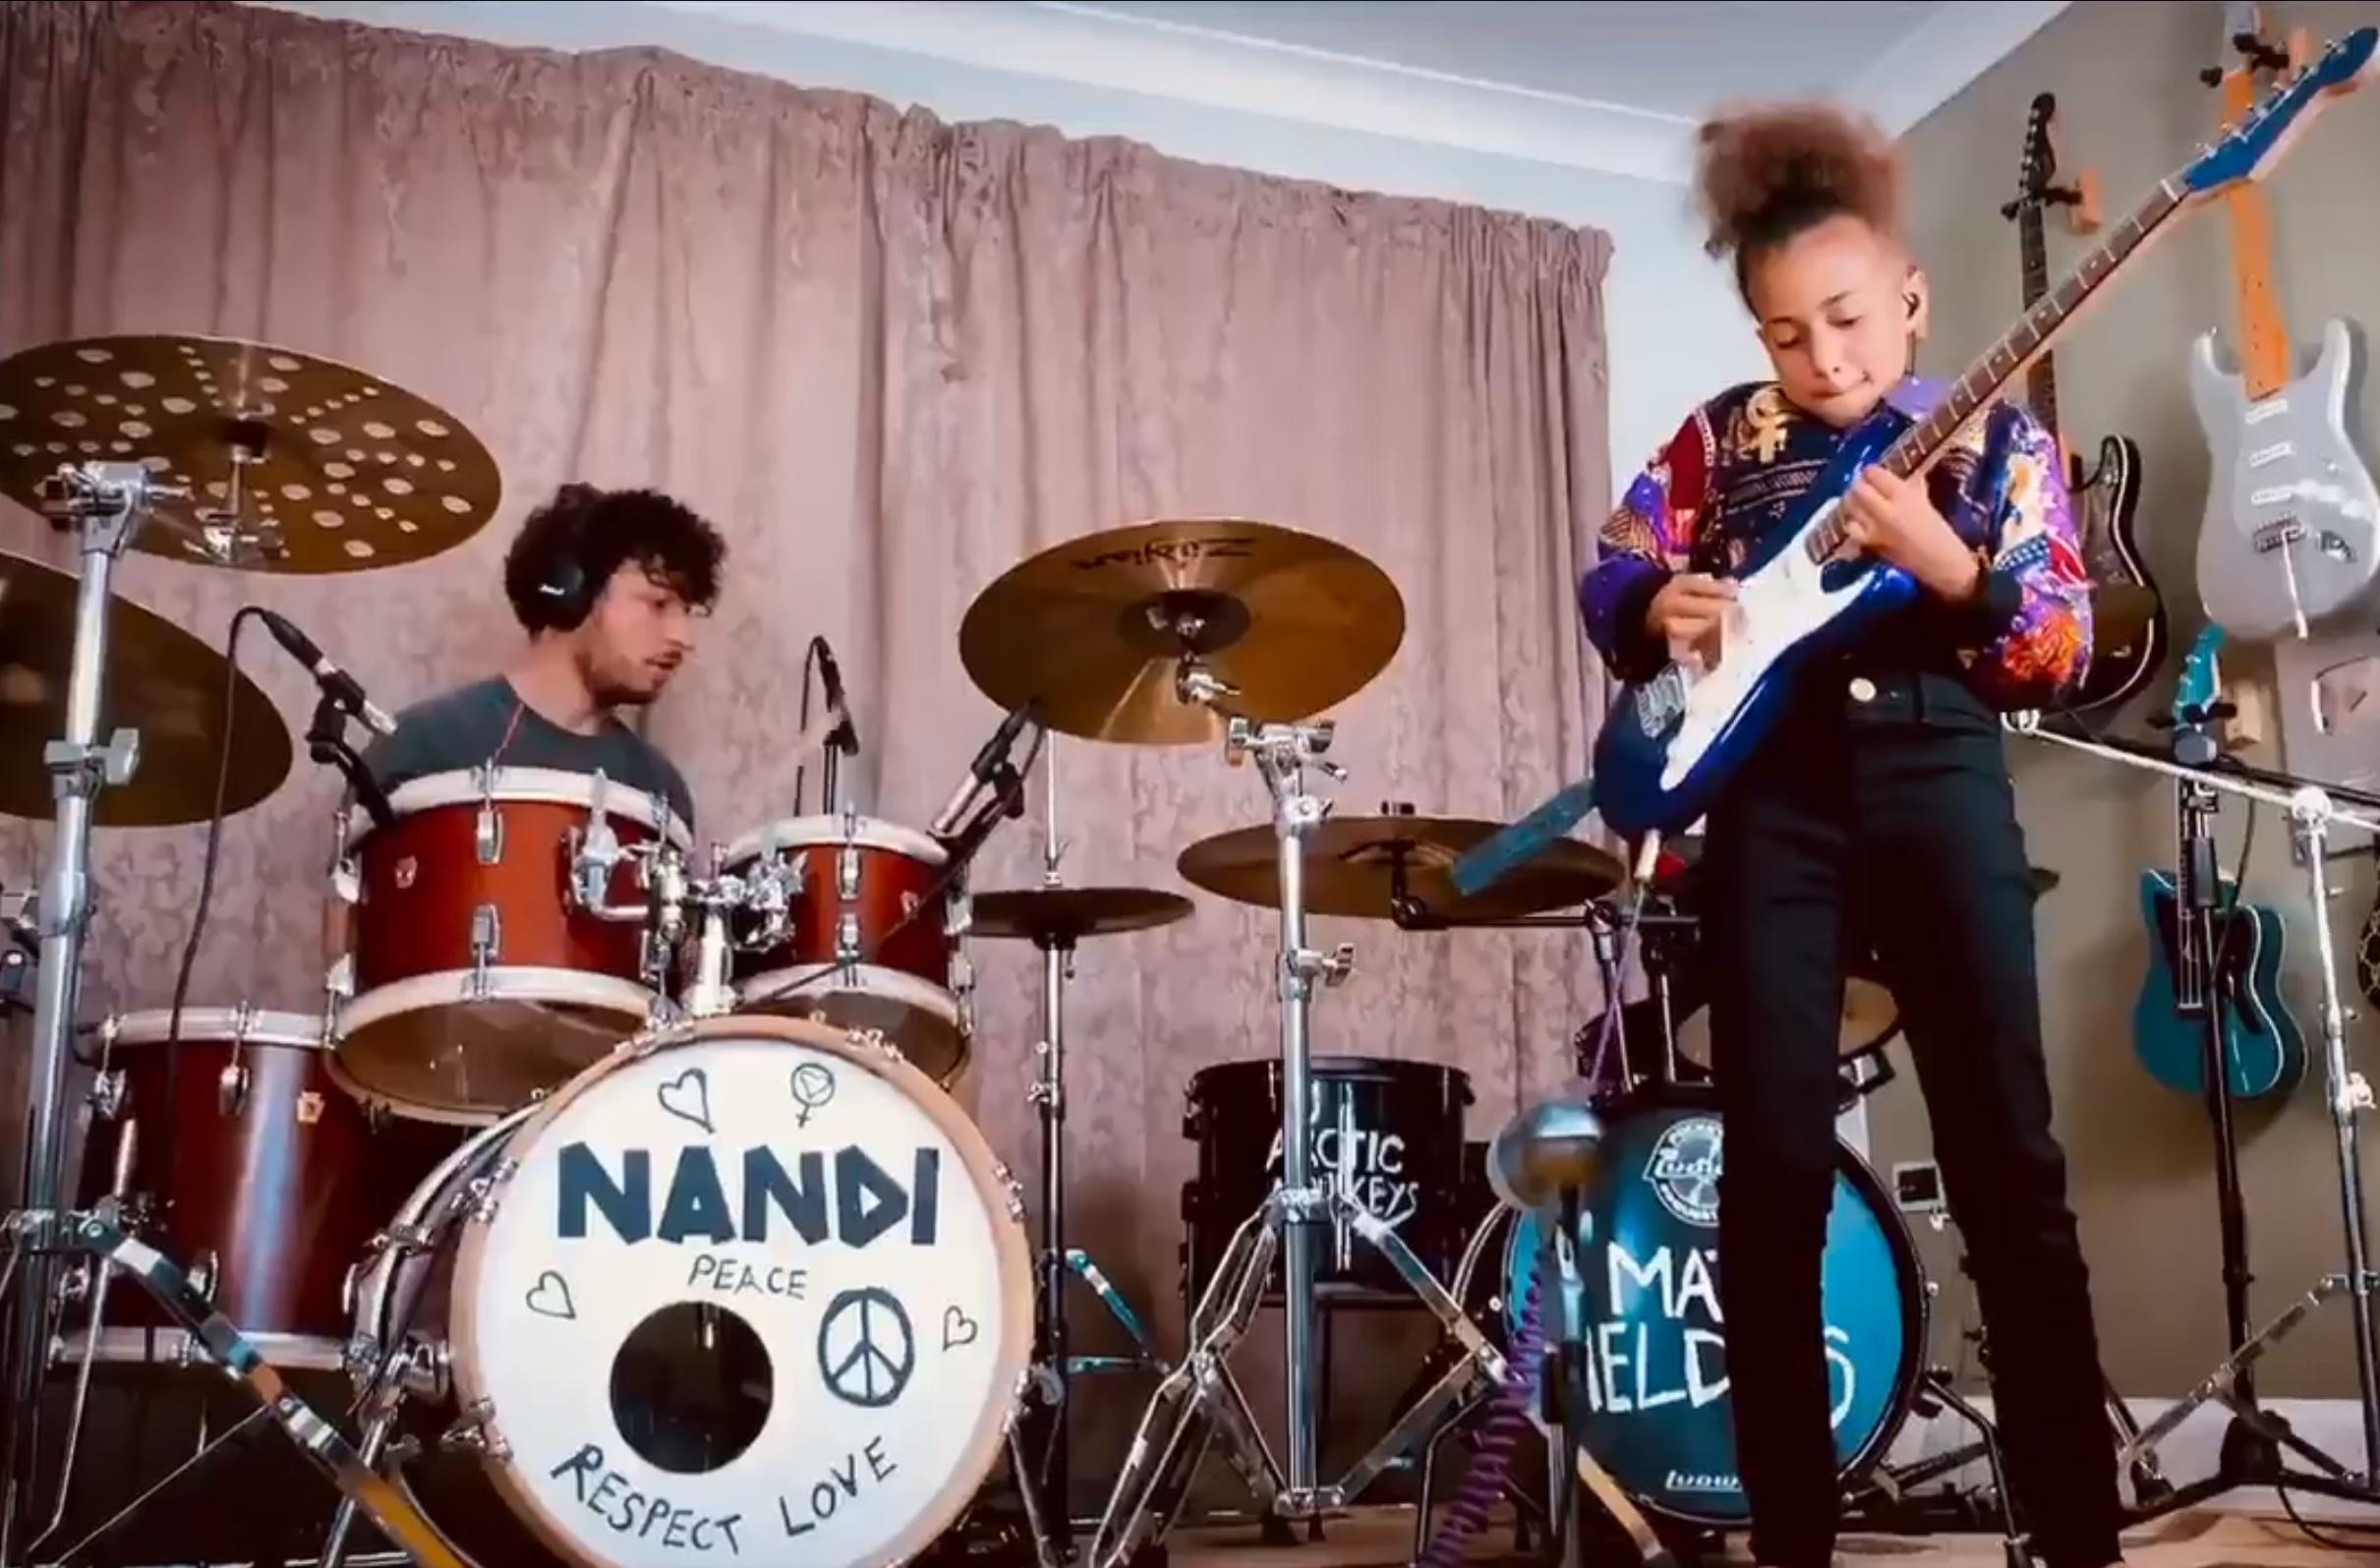 Watch Nandi Bushell and Arctic Monkeys Drummer Matt Helders Cover 'I Bet You Look Good on the Dancefloor'